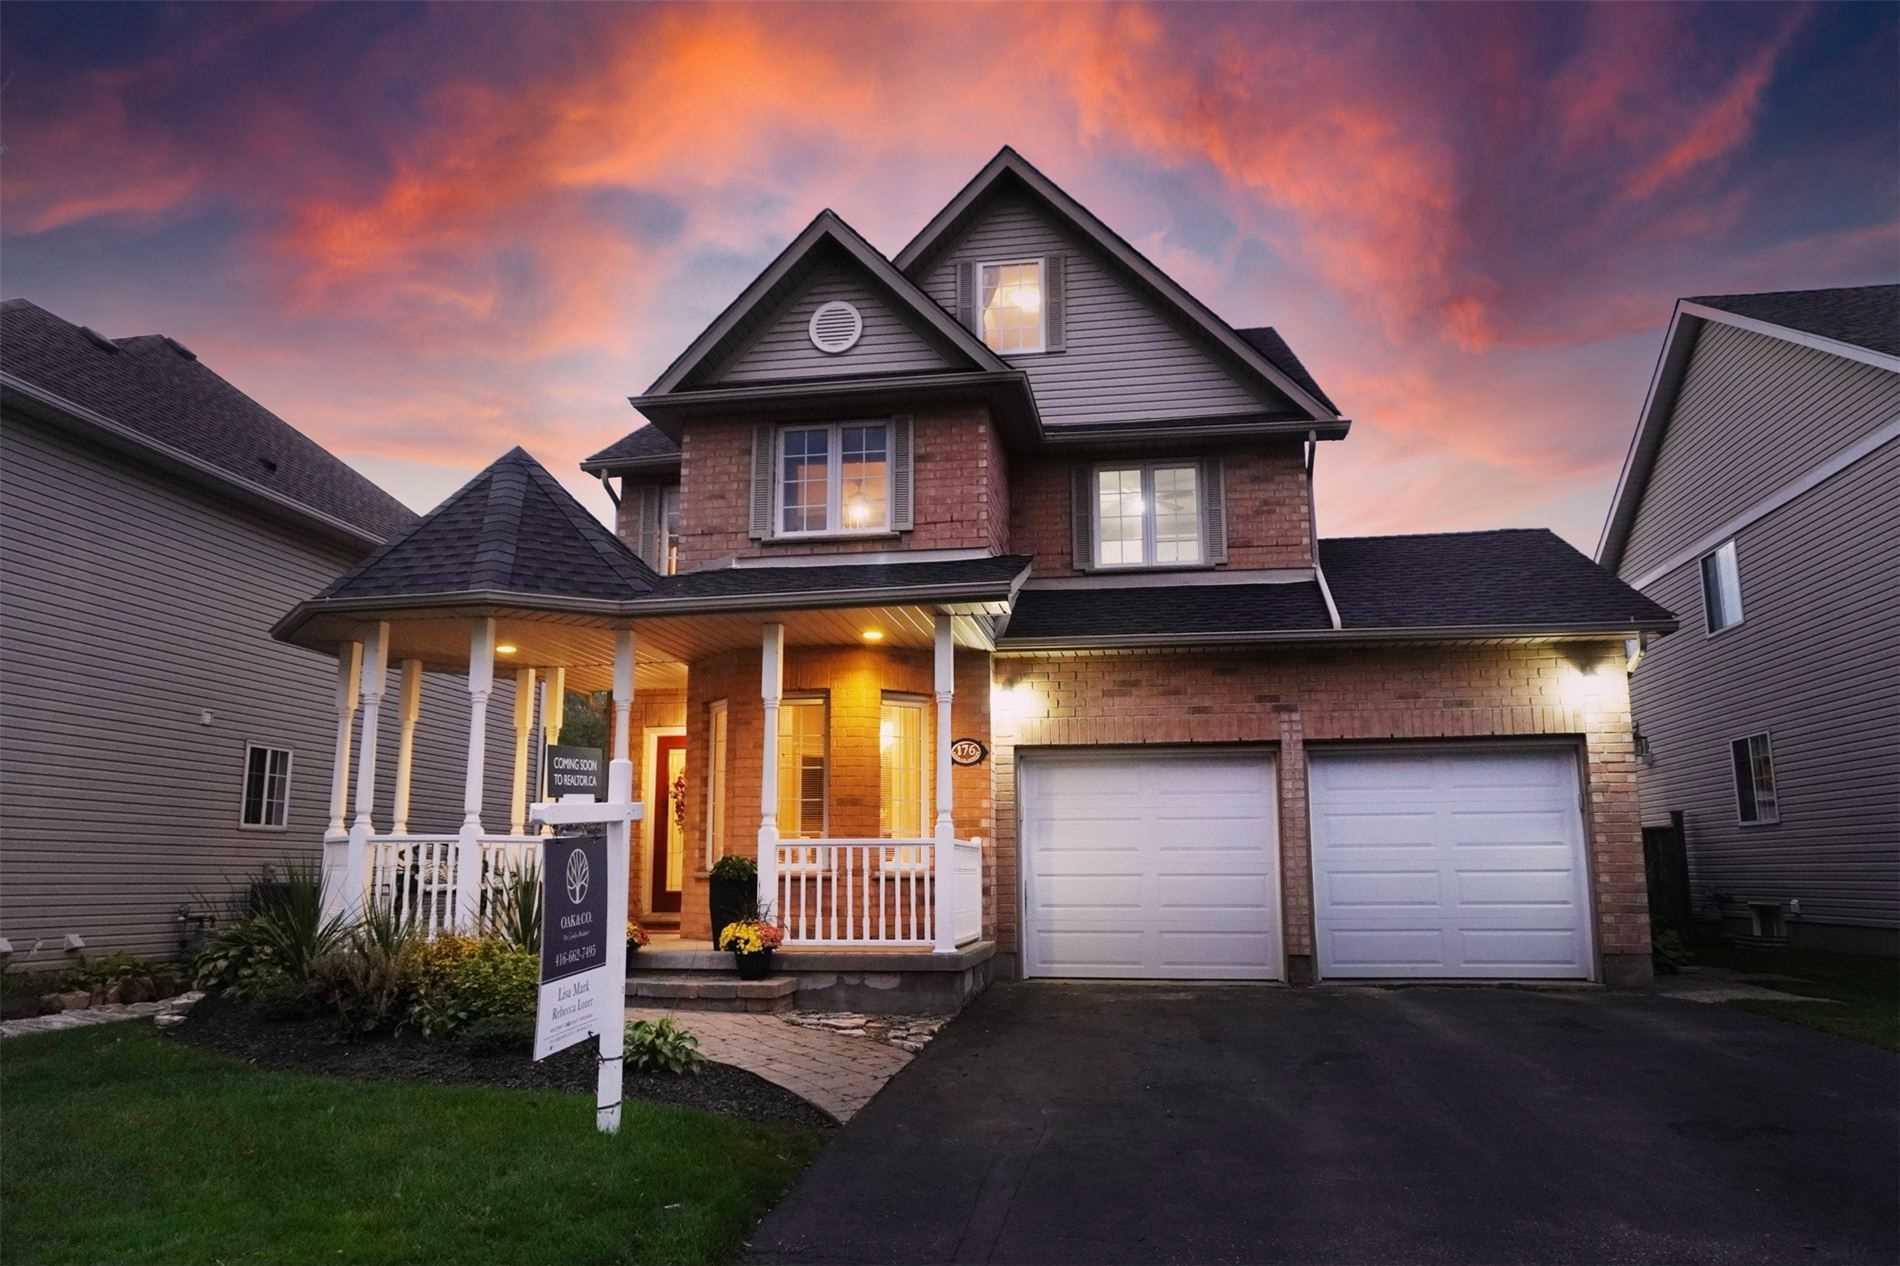 Detached house For Sale In Guelph/Eramosa - 176 Dunbar St, Guelph/Eramosa, Ontario, Canada N0B2K0 , 4 Bedrooms Bedrooms, ,3 BathroomsBathrooms,Detached,For Sale,Dunbar